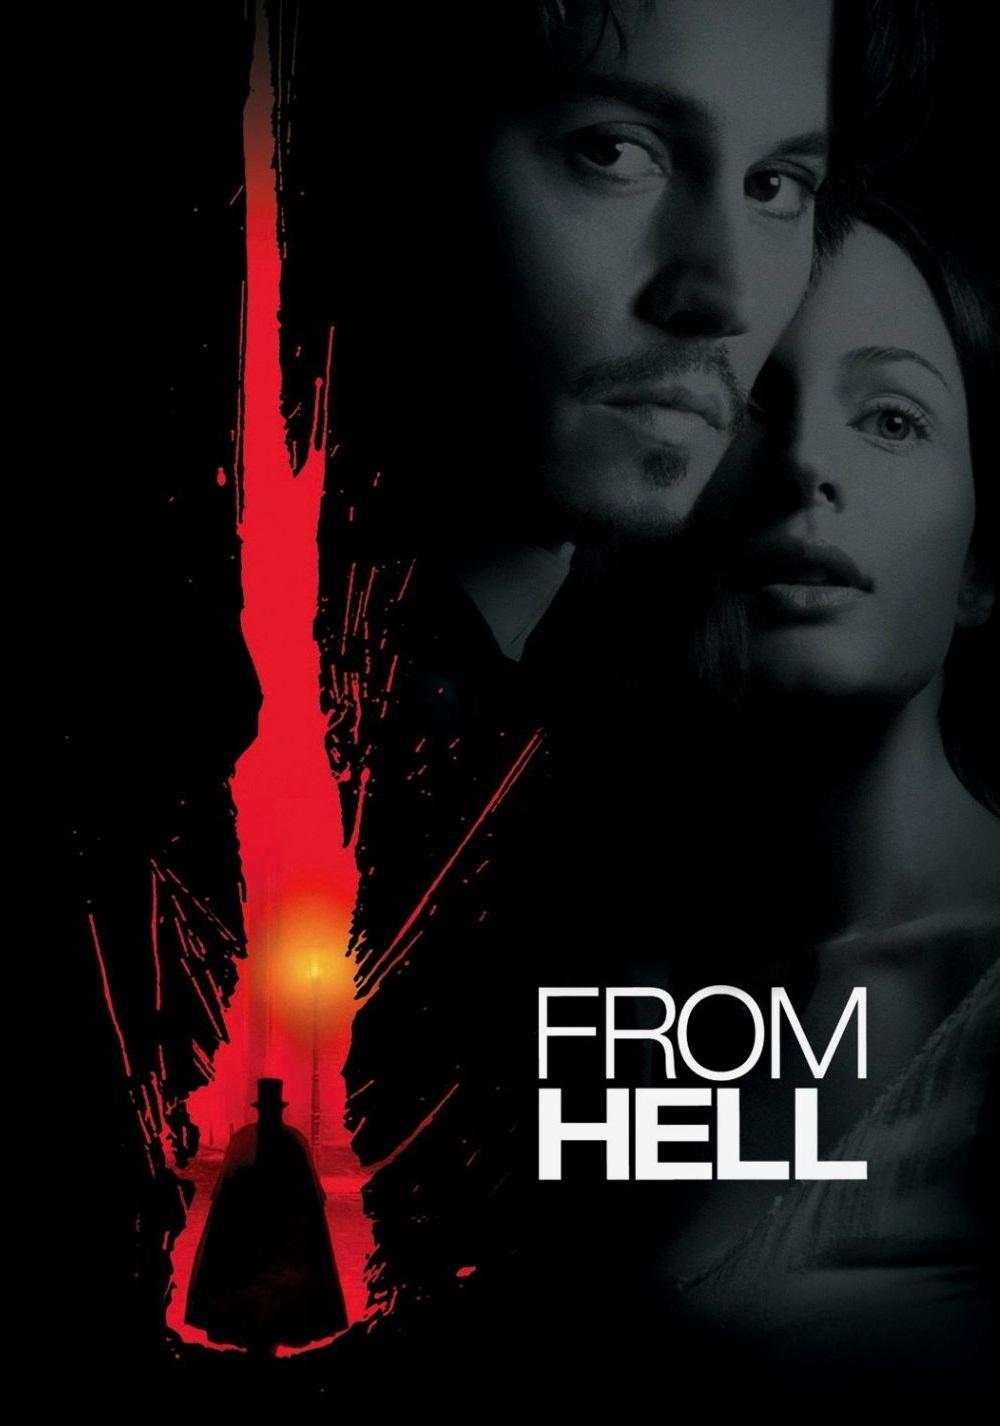 From Hell | Movie fanart | fanart.tv